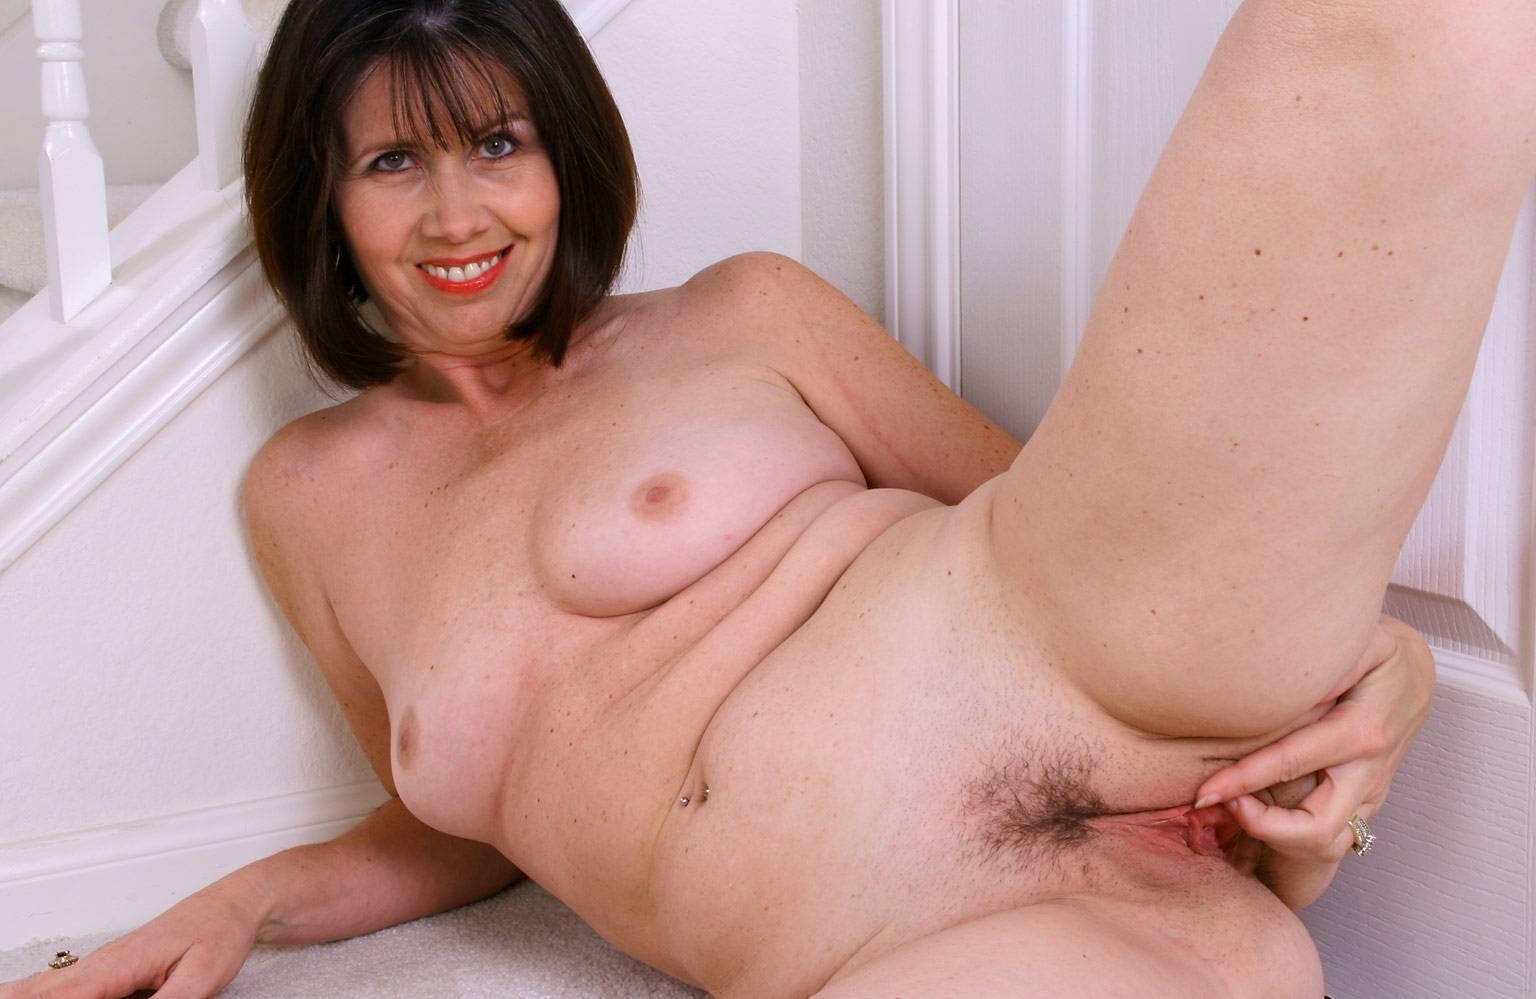 brigitte bielsen porn mobile